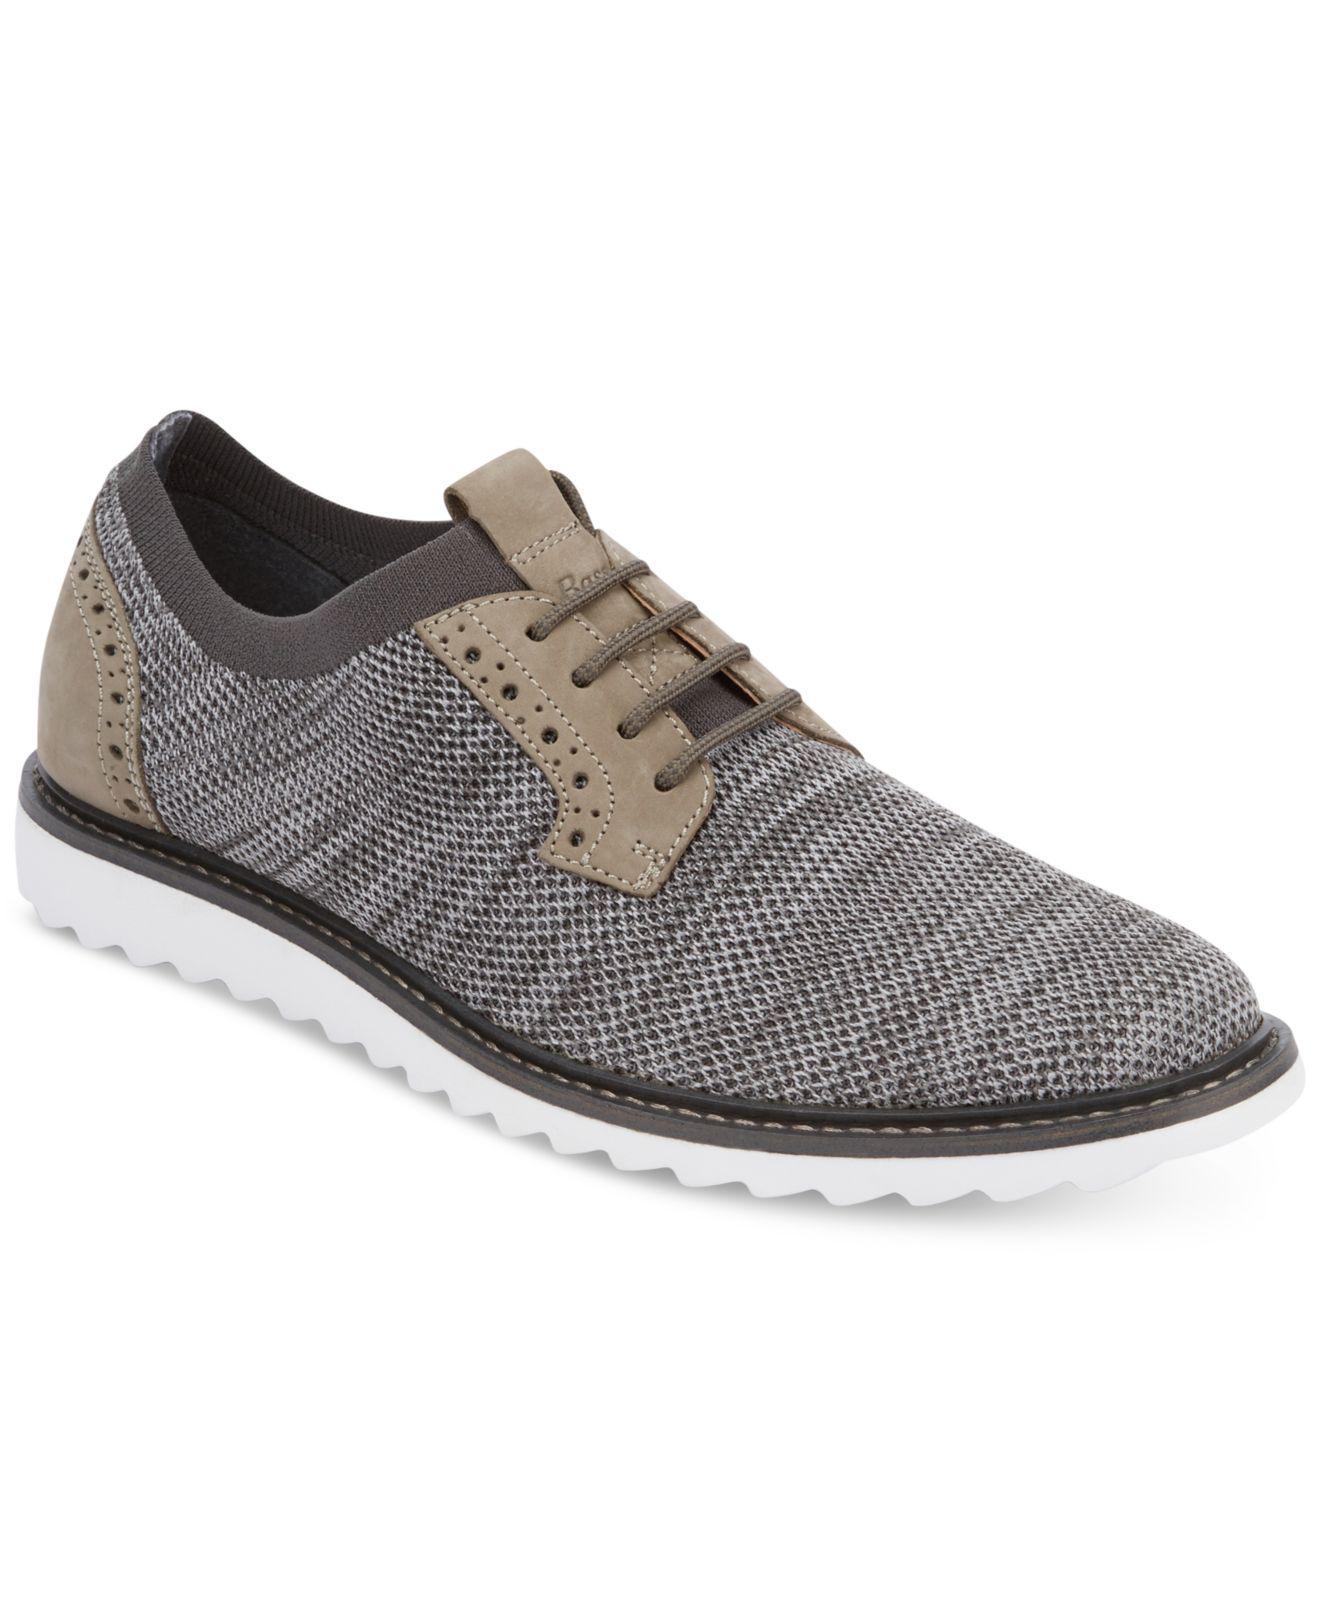 G.H. Bass & Co. Gray Men's Buck 2.0 Plain-toe Knit Oxfords